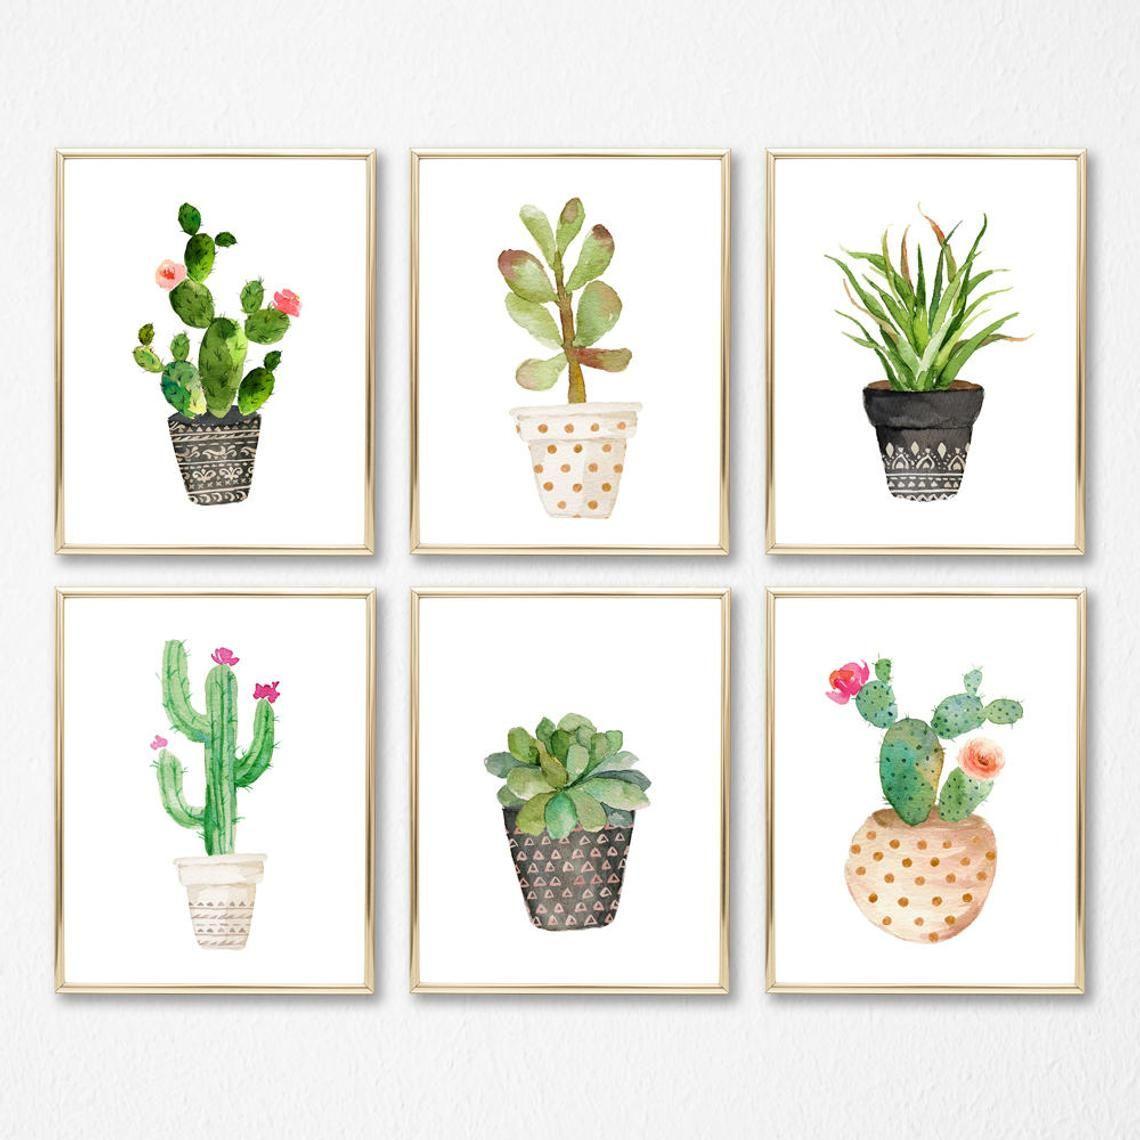 Photo of Set of 6 Cute Cacti Watercolor Digital Print Instant Art INSTANT DOWNLOAD Printable Wall Decor Nursery Room, girl room, boy room